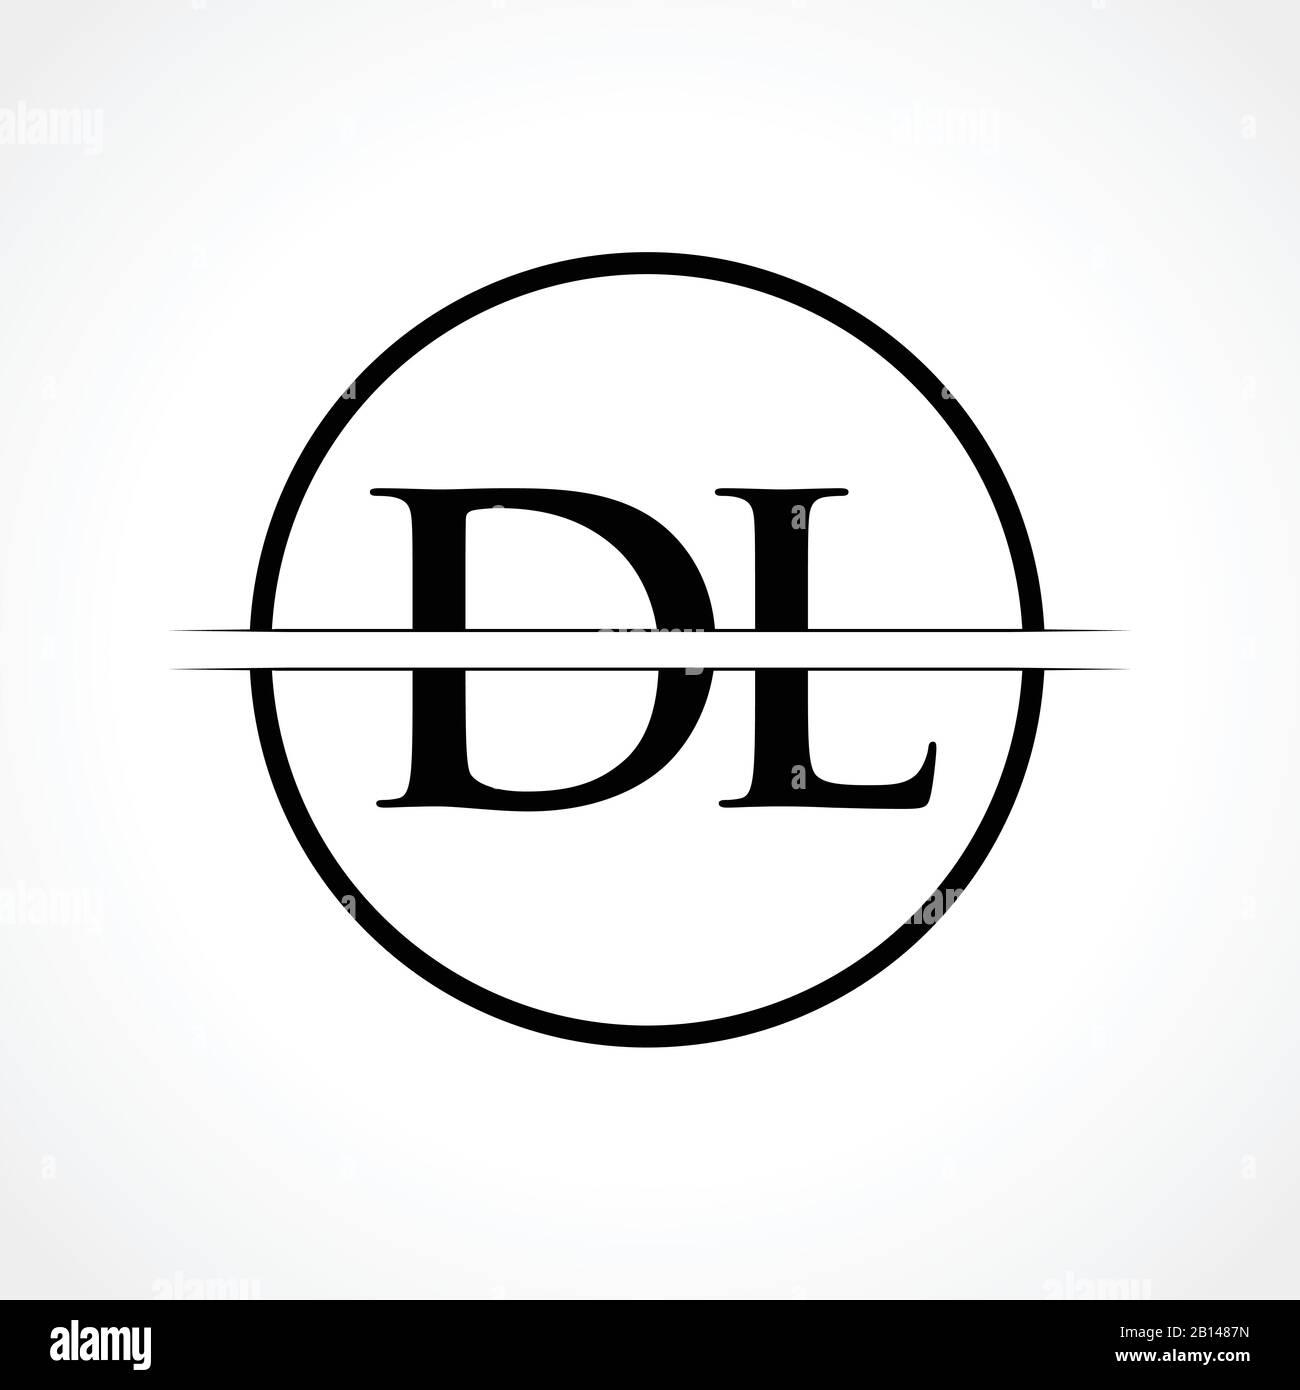 Initial Dl Letter Logo Design Vector Template With Black Color Dl Logo Design Stock Vector Image Art Alamy